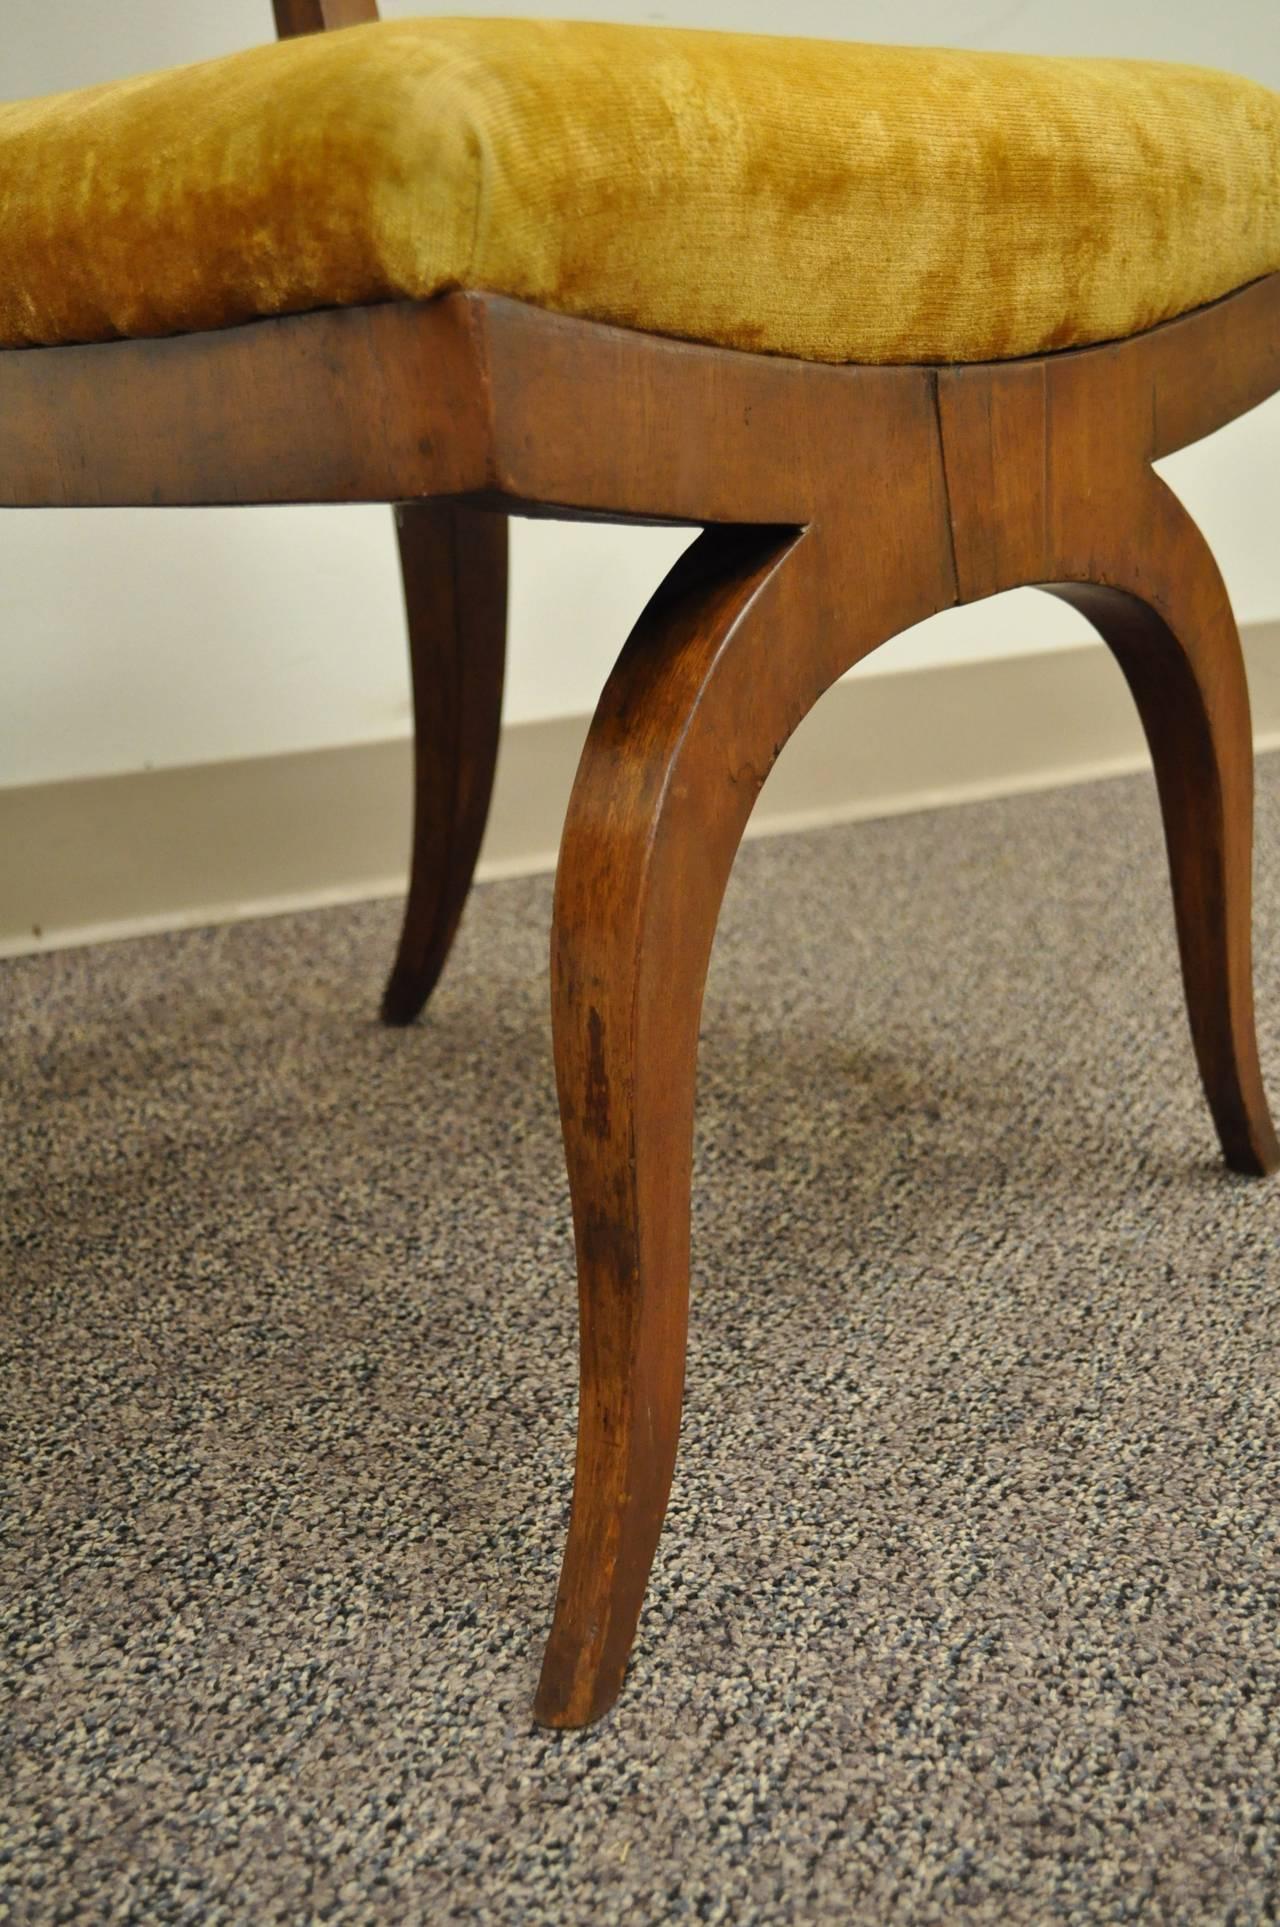 19th Century Pair of 19th C Biedermeier Ebonized & Burl Walnut Curule Base Side Accent Chairs For Sale